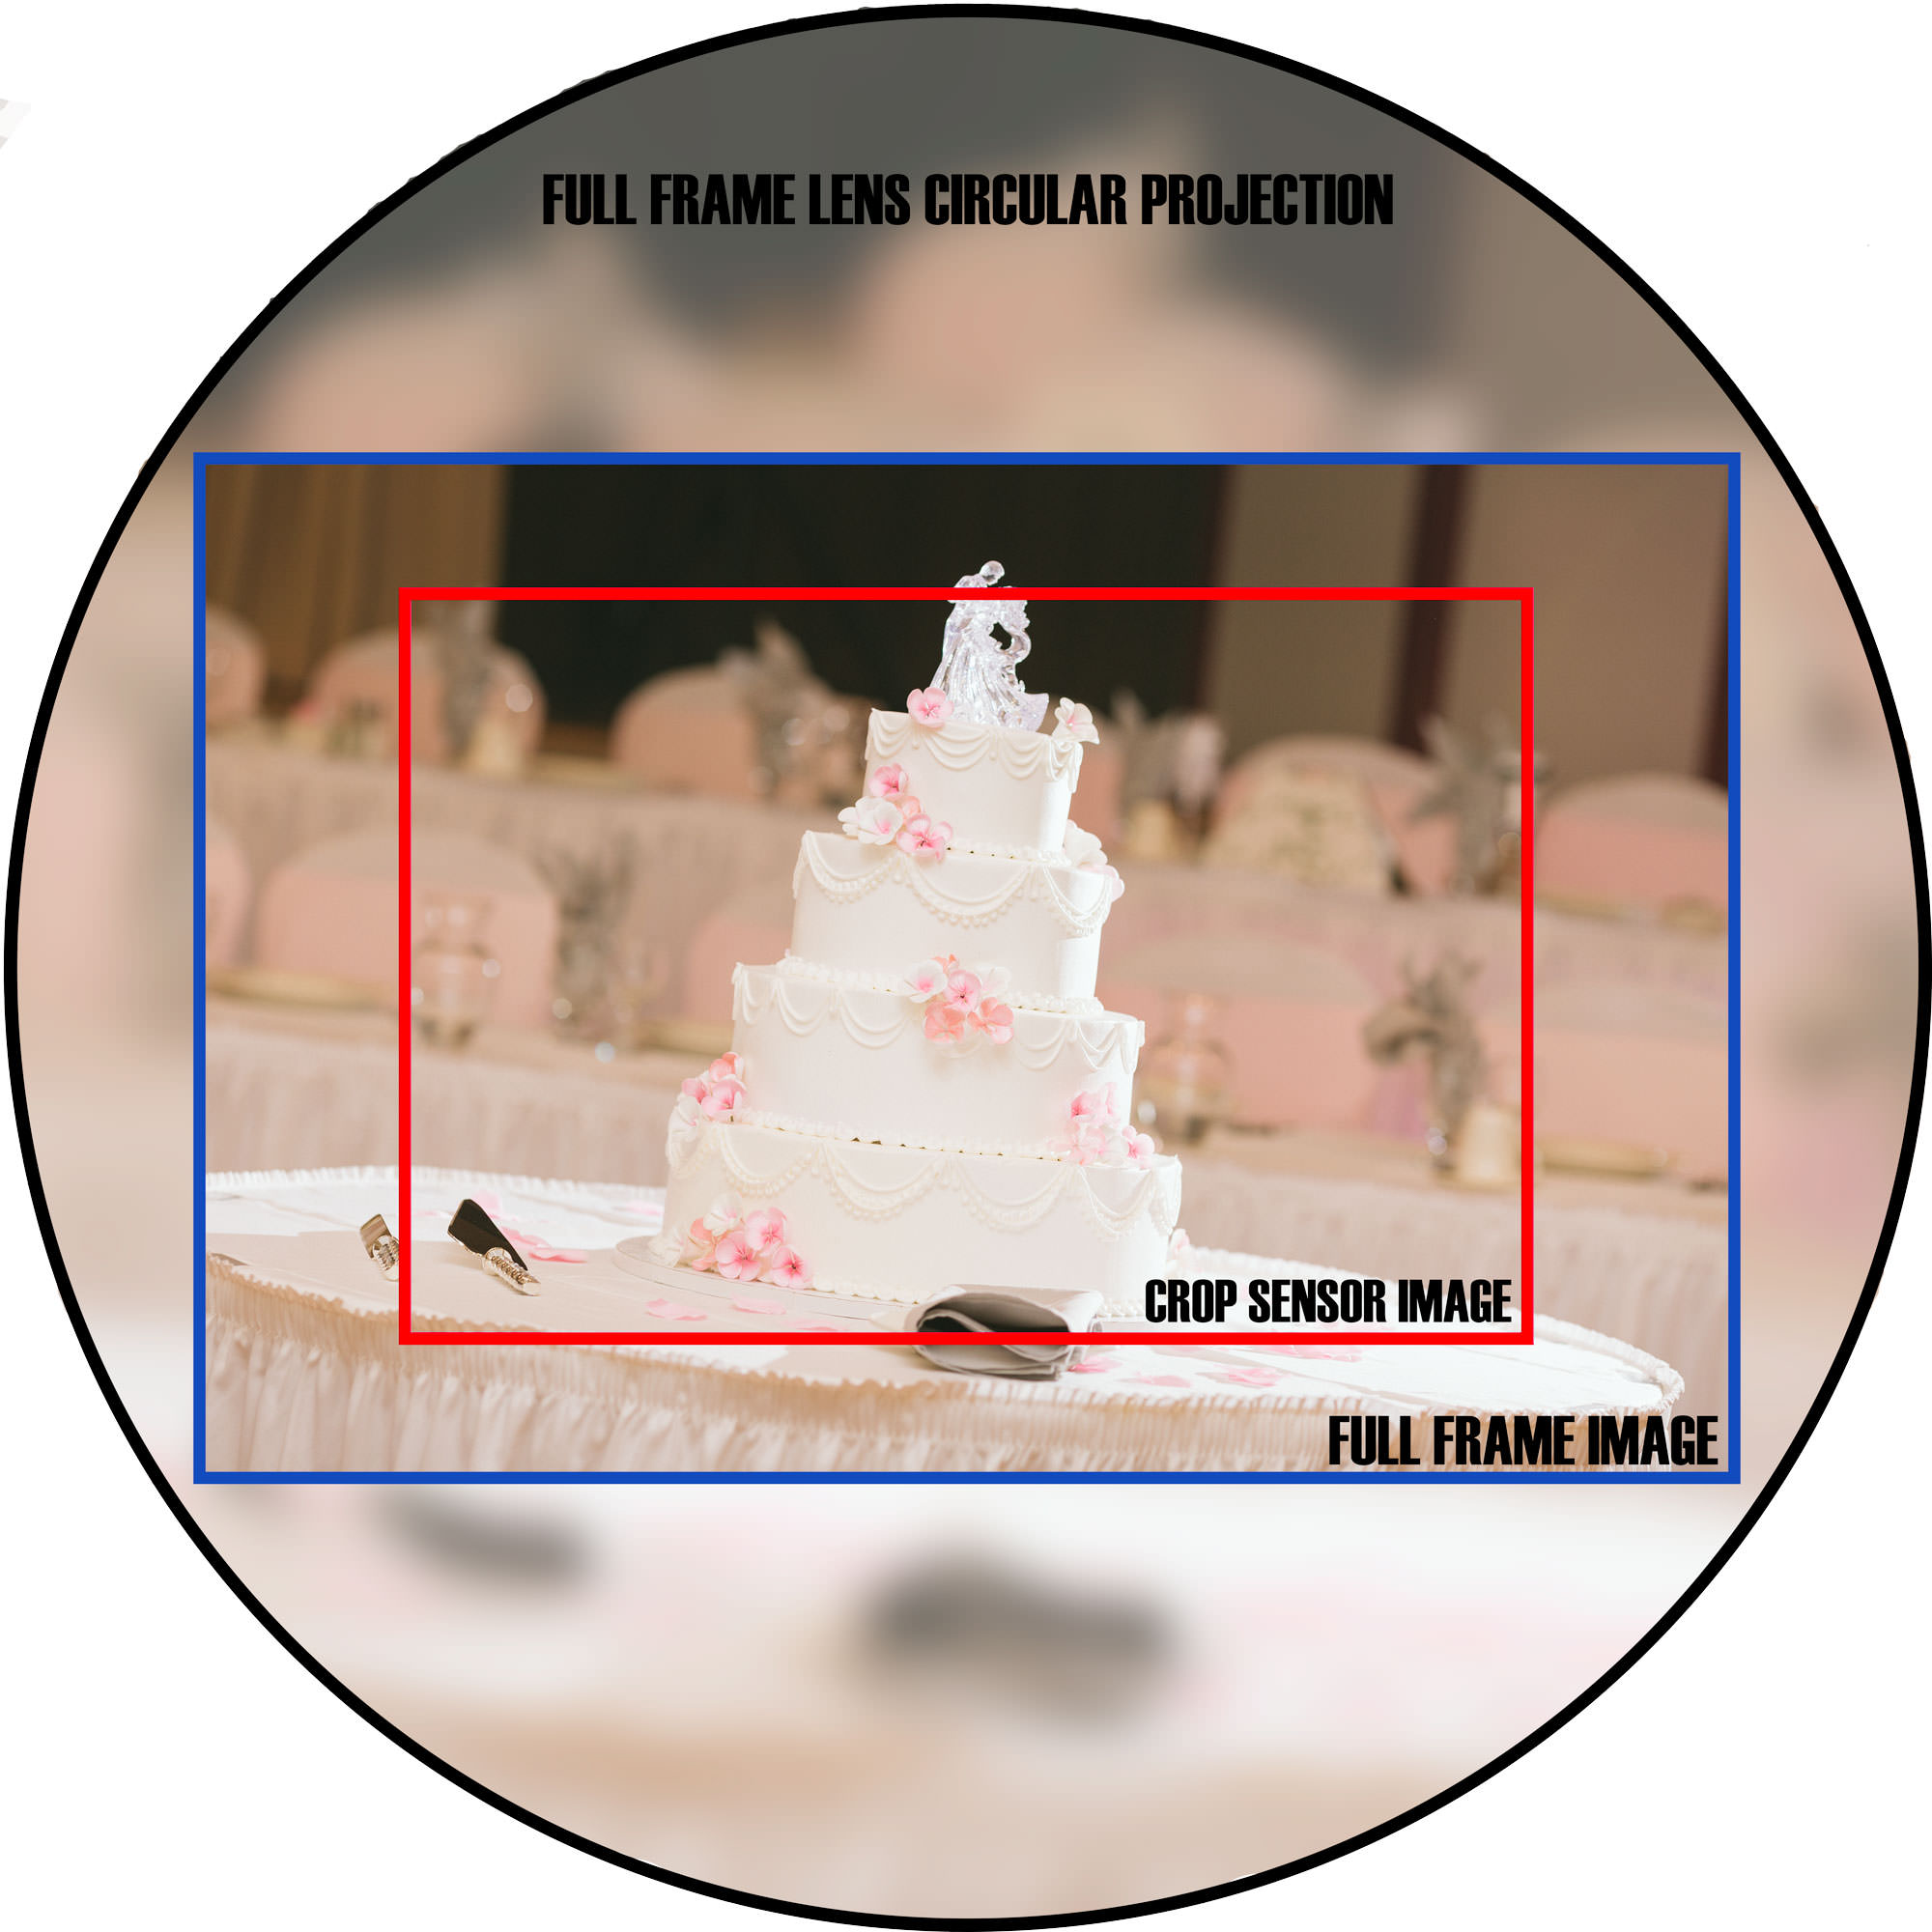 photography-crop-factor-image-circle